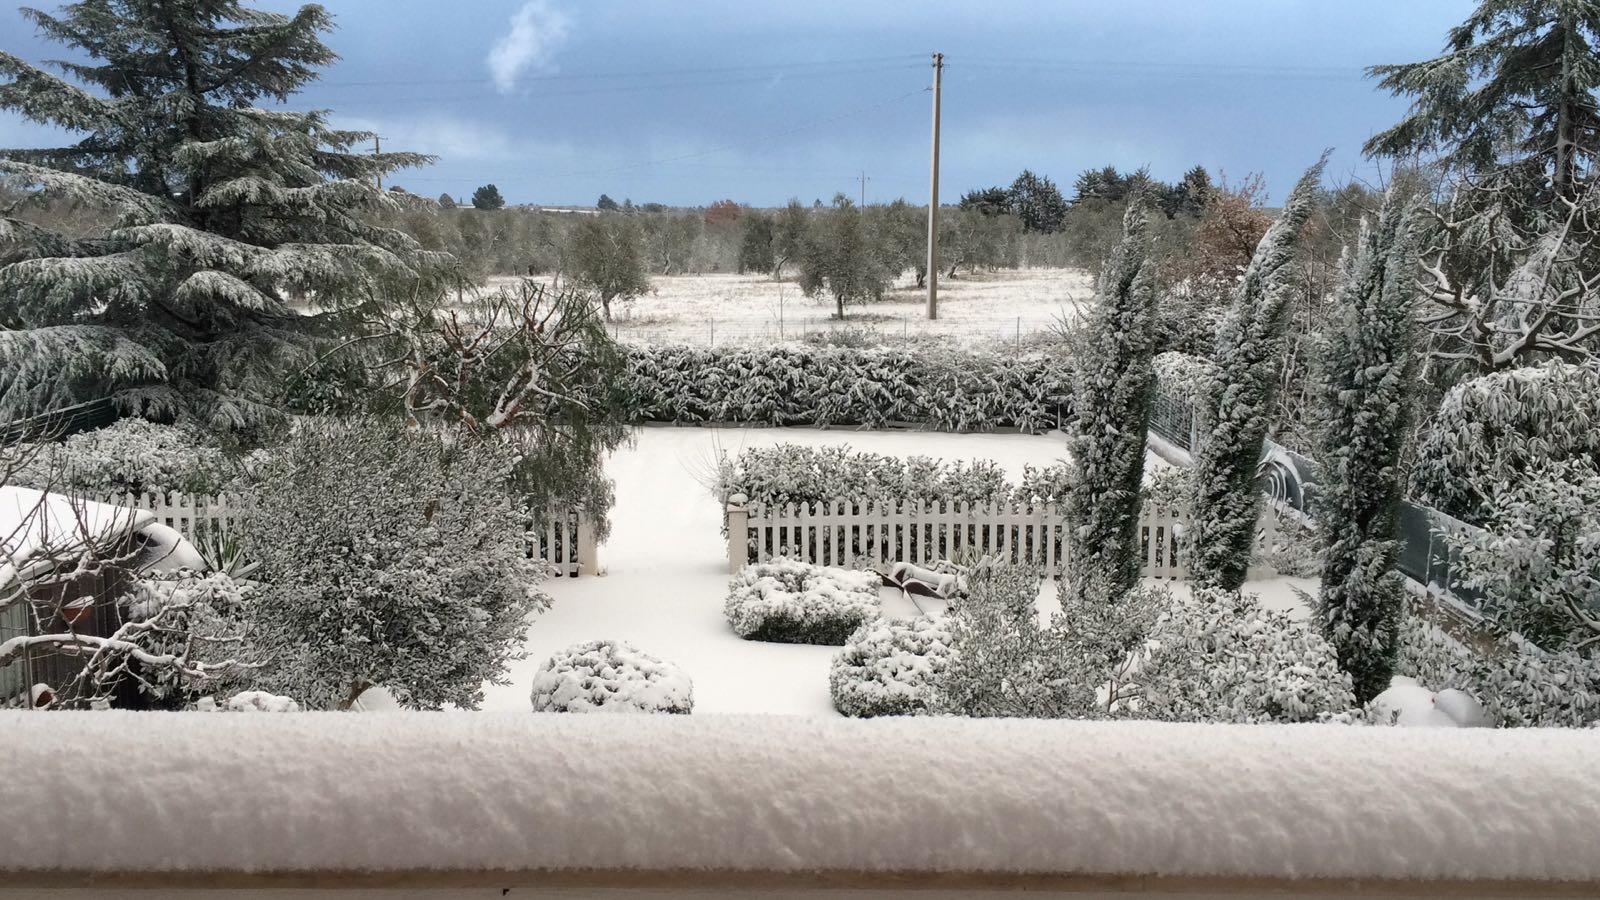 Gelo e neve d'Epifania 2017_qui tutte le FOTO e i VIDEO-161467af-c010-4bcb-9a18-bf478827e026.jpg